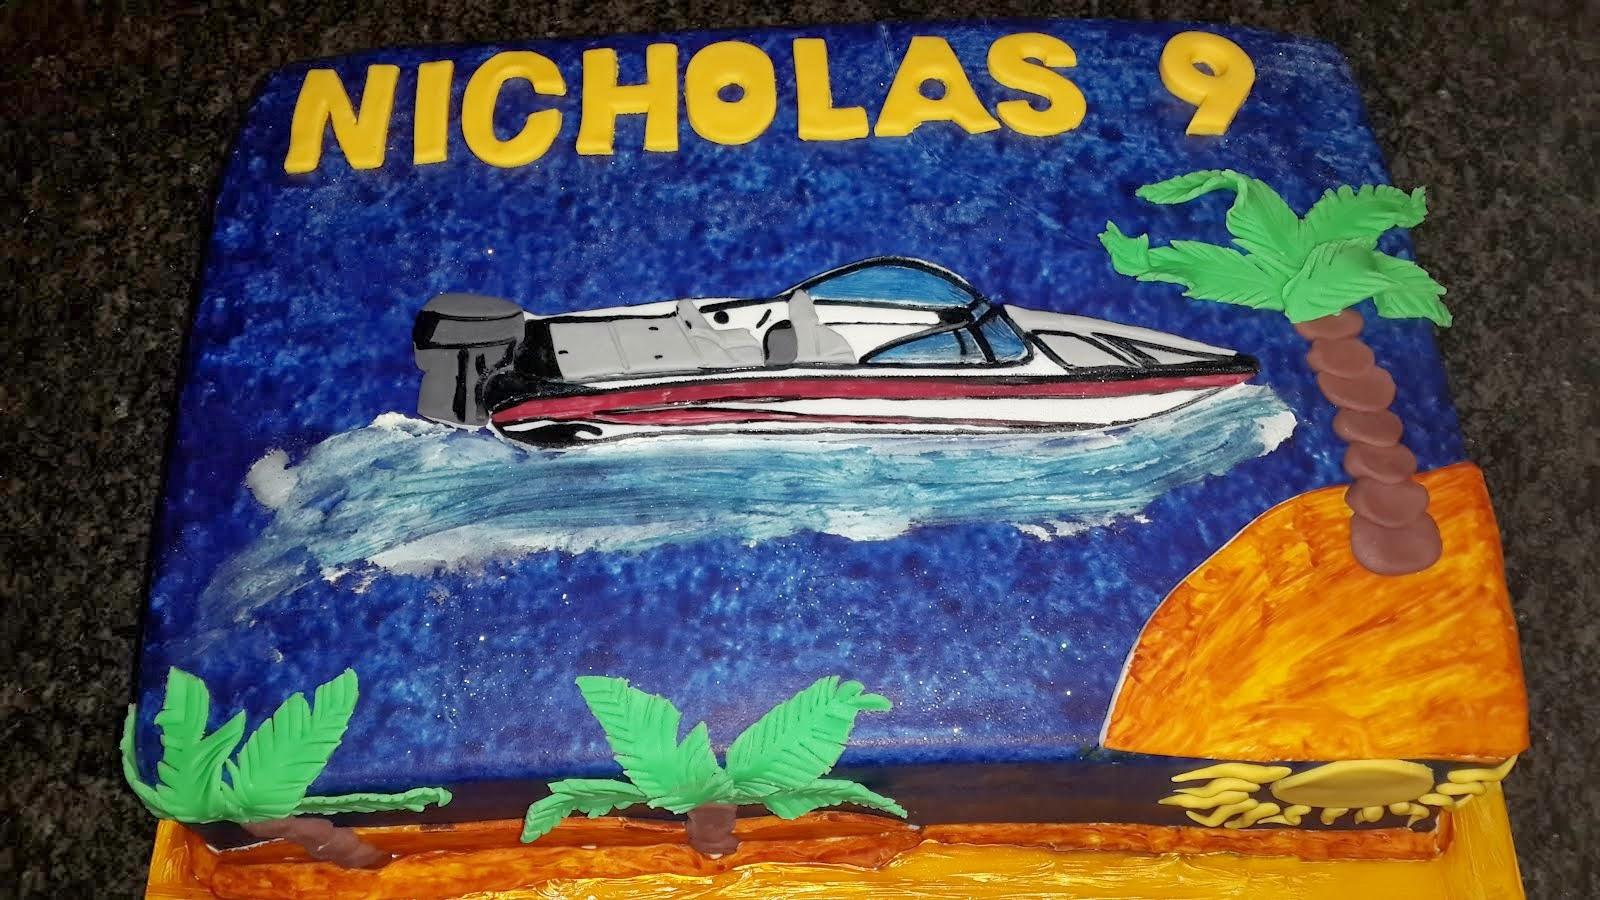 Nicholas's ski boat cake